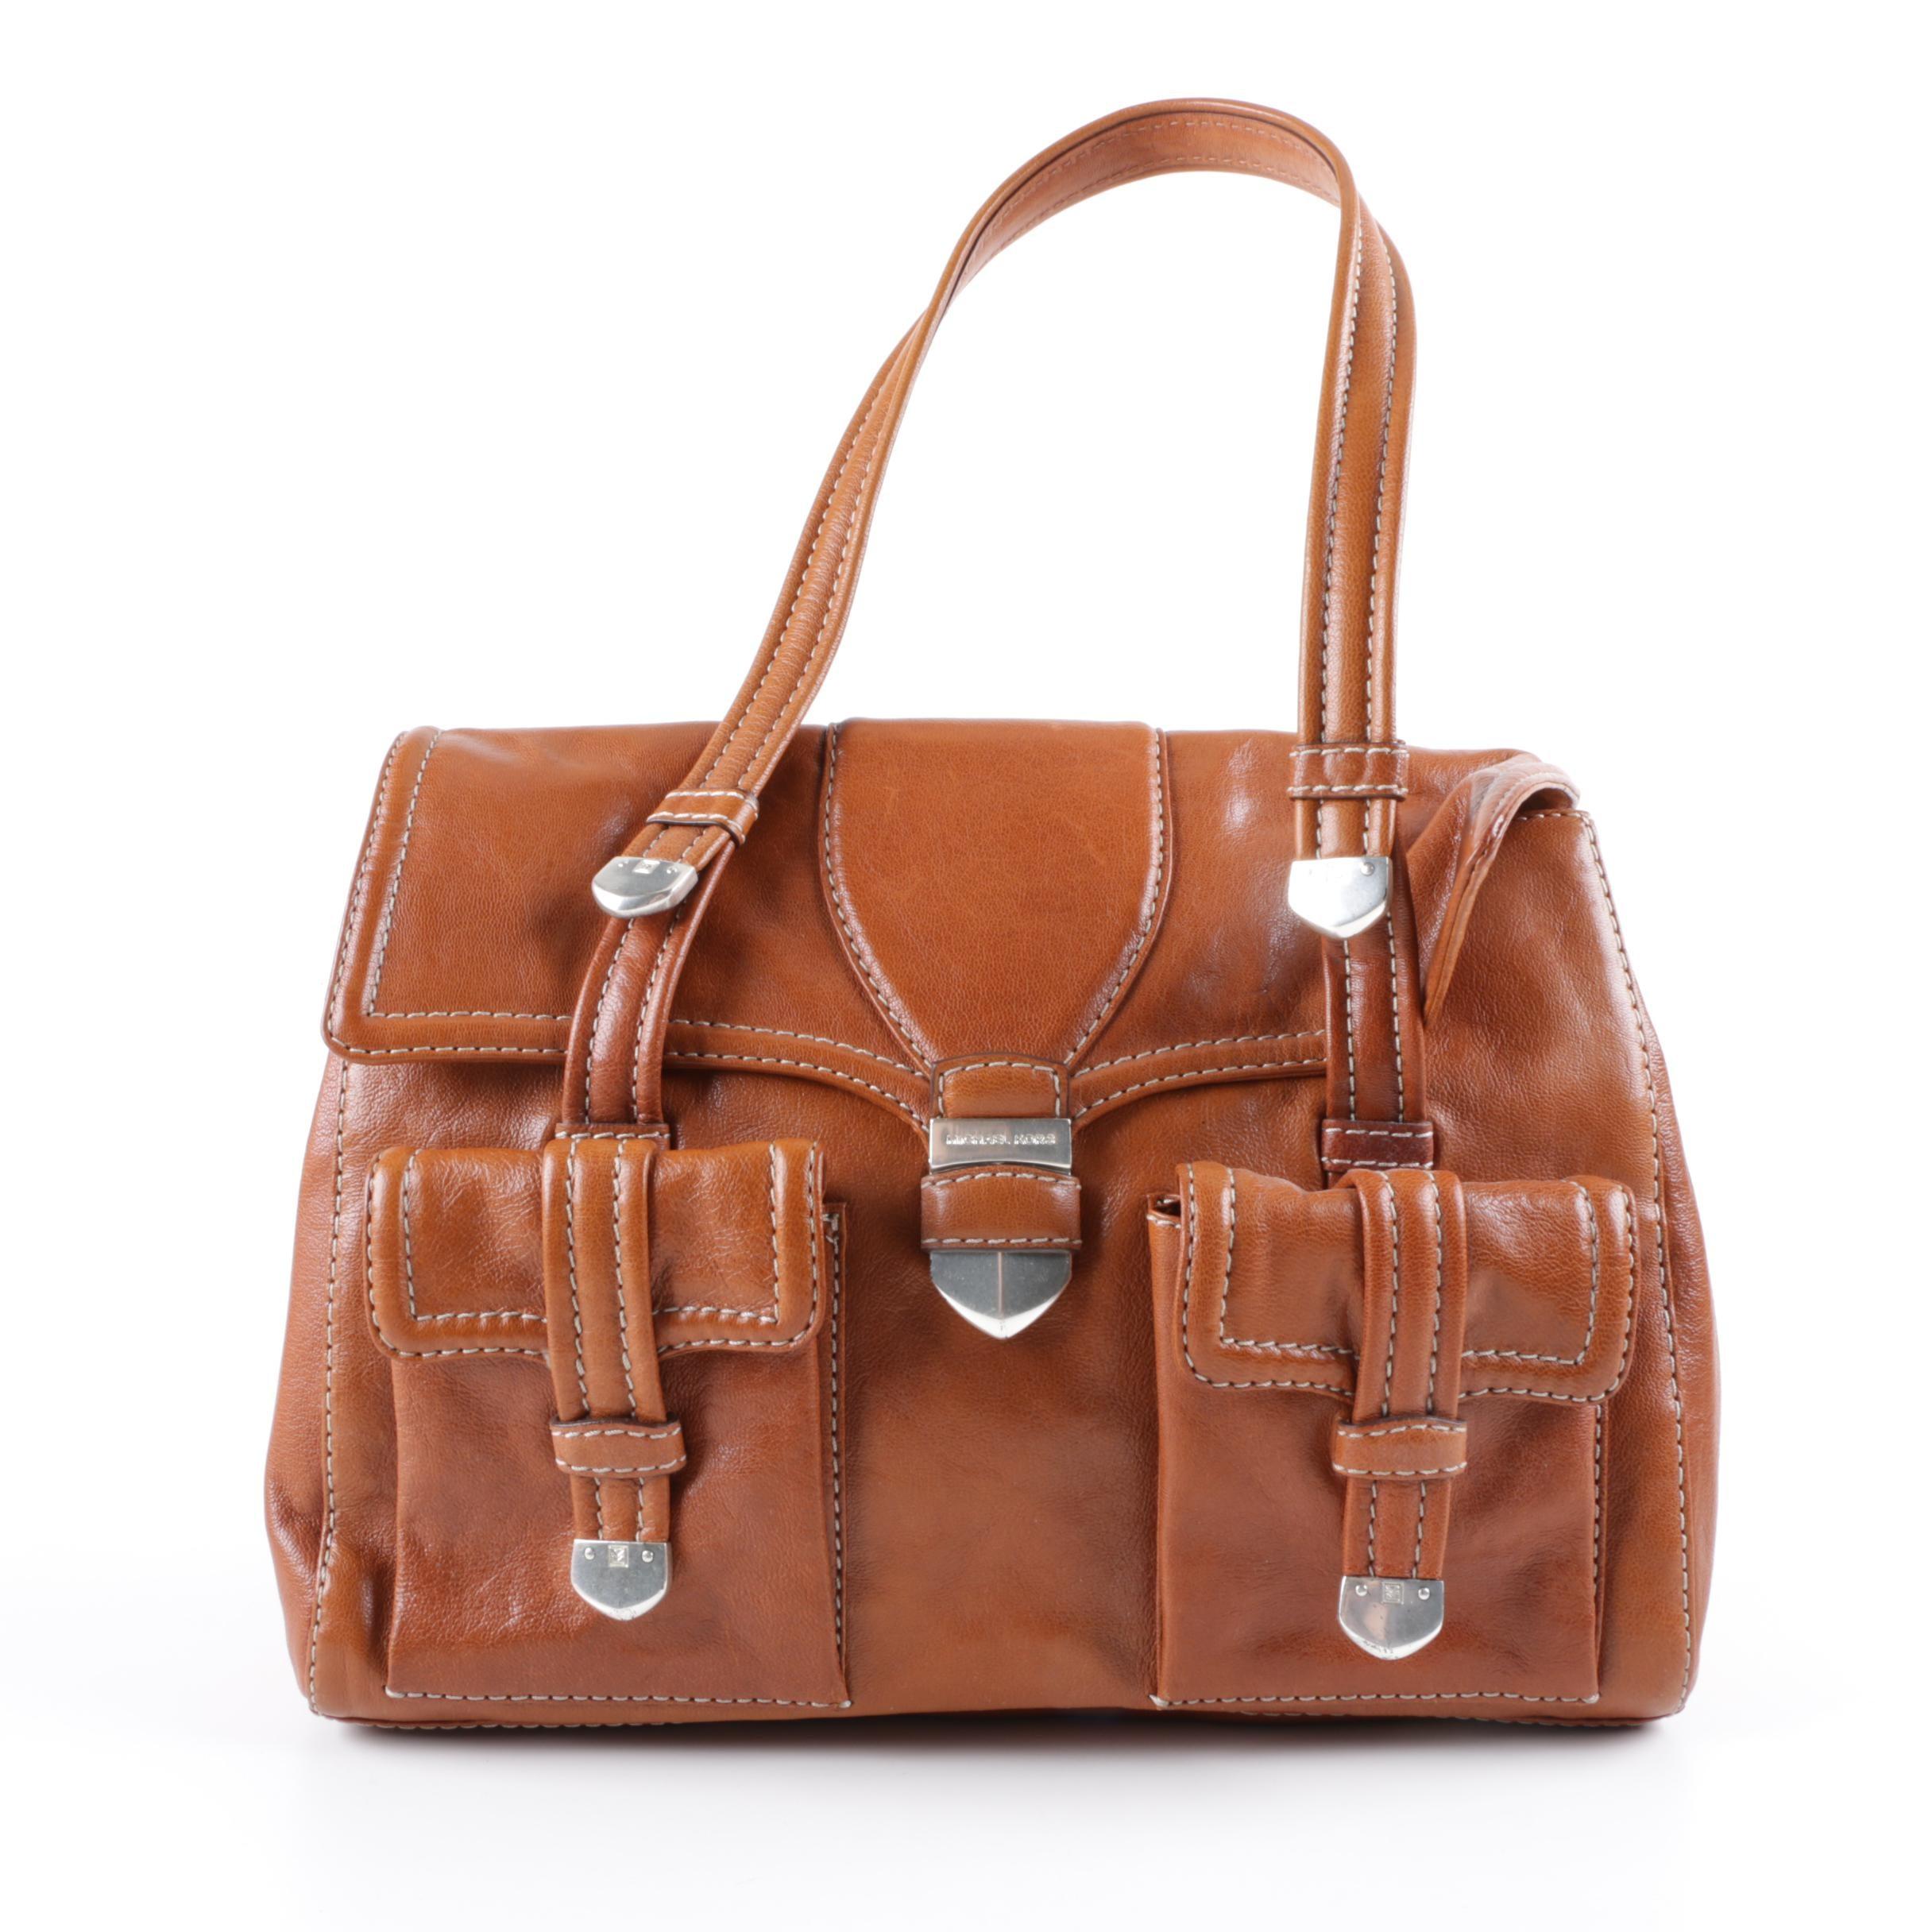 MICHAEL Michael Kors Brown Leather Satchel